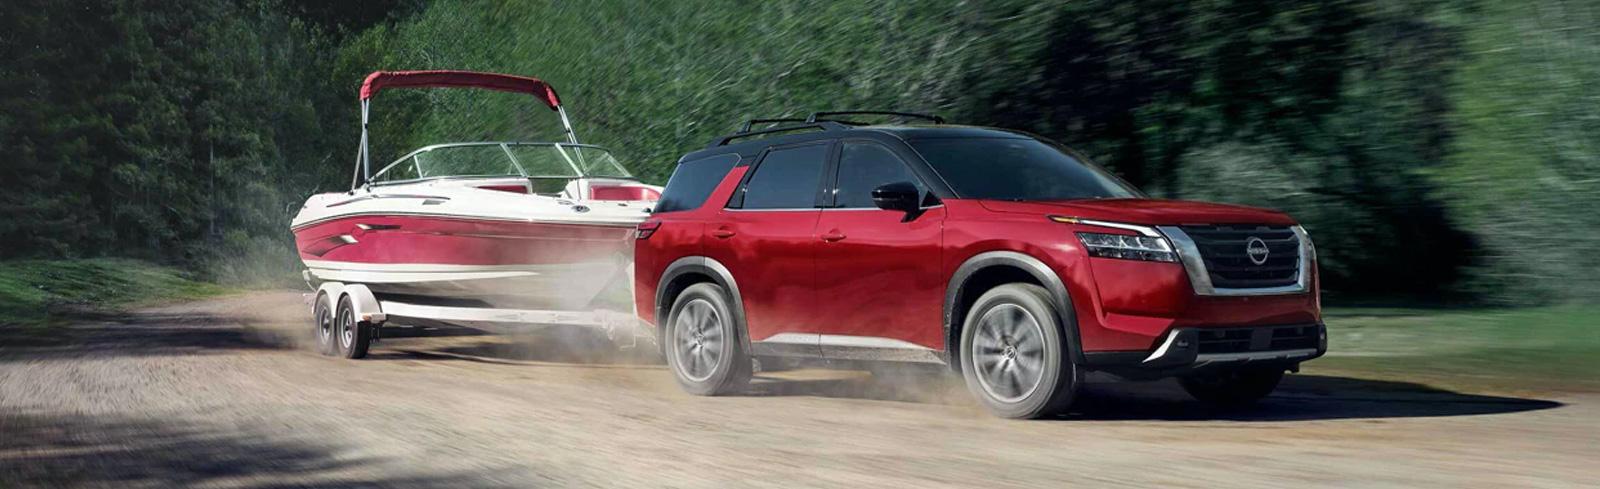 2022 Nissan Pathfinder For Sale Near Salem, NH